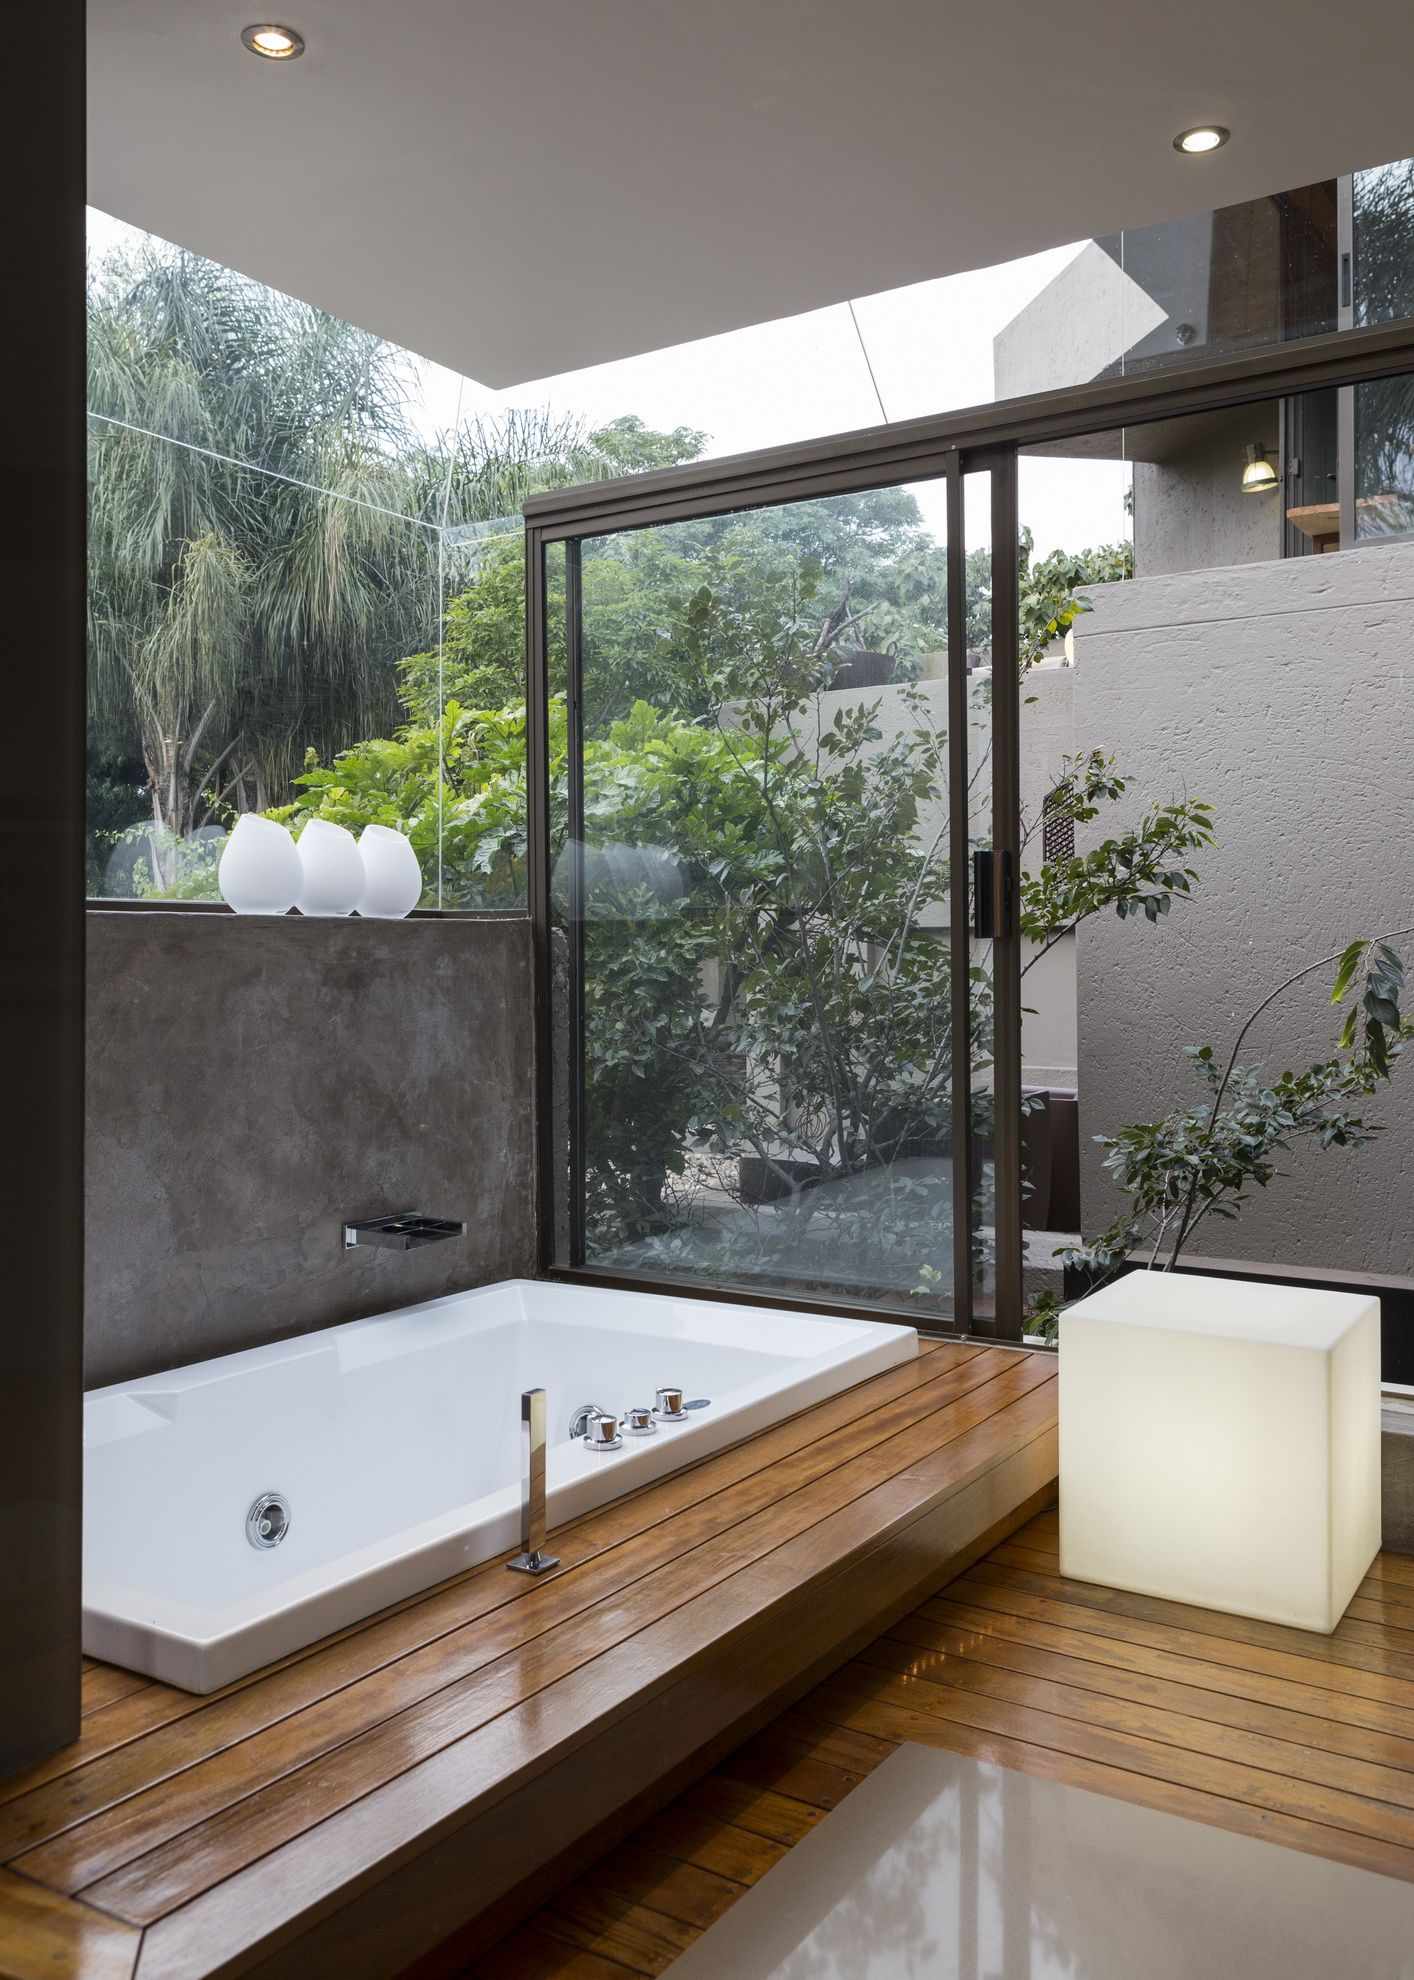 no man's land | Interior Inspiration ♥ | House Fern | Bathroom | M Square Lifestyle Design | M Square Lifestyle Design #Design #Bathroom #Interior #Contemporary